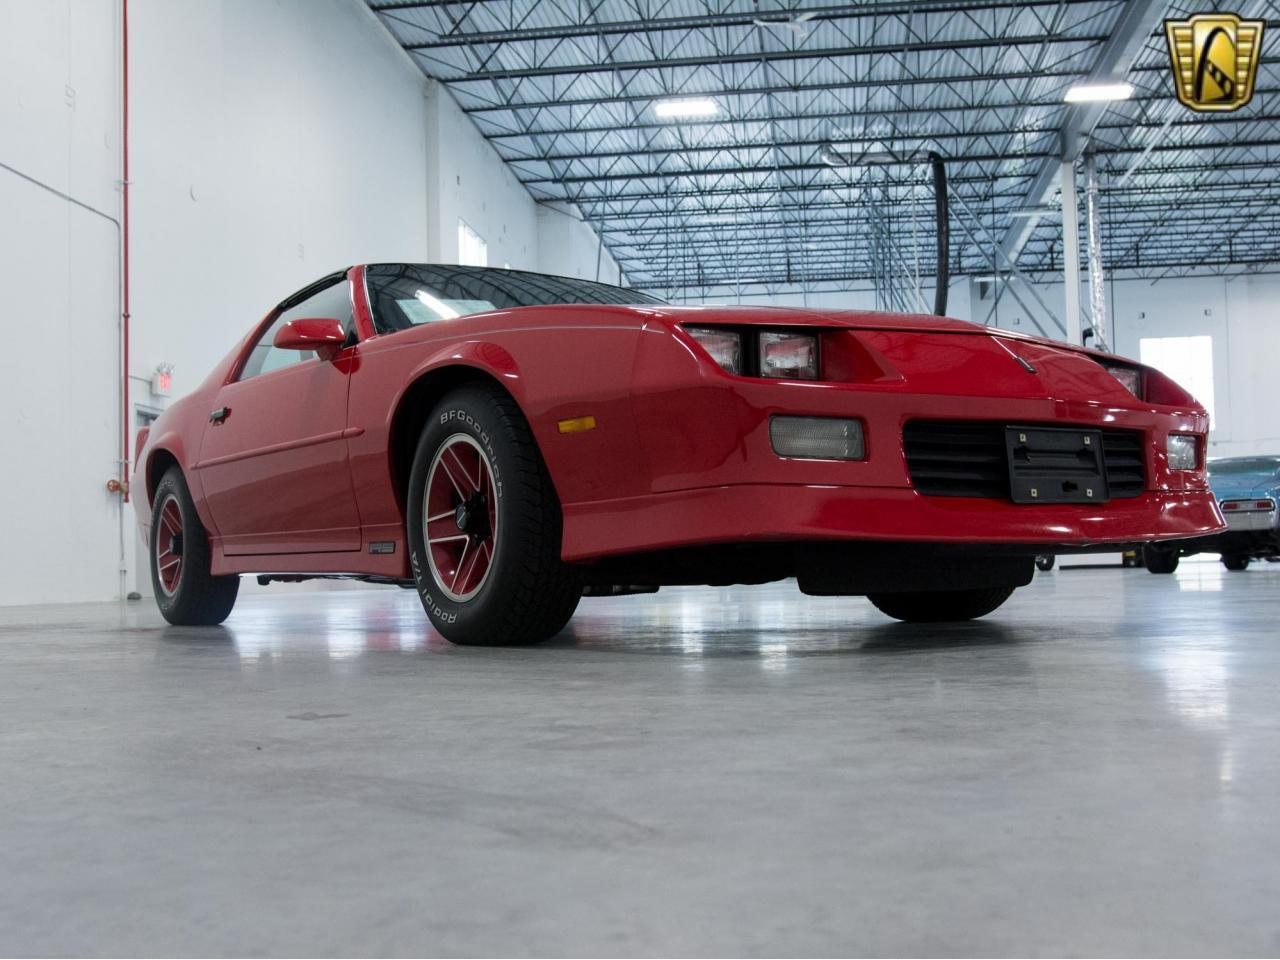 Large Picture of 1989 Camaro located in Kenosha Wisconsin - $17,995.00 - KE4I